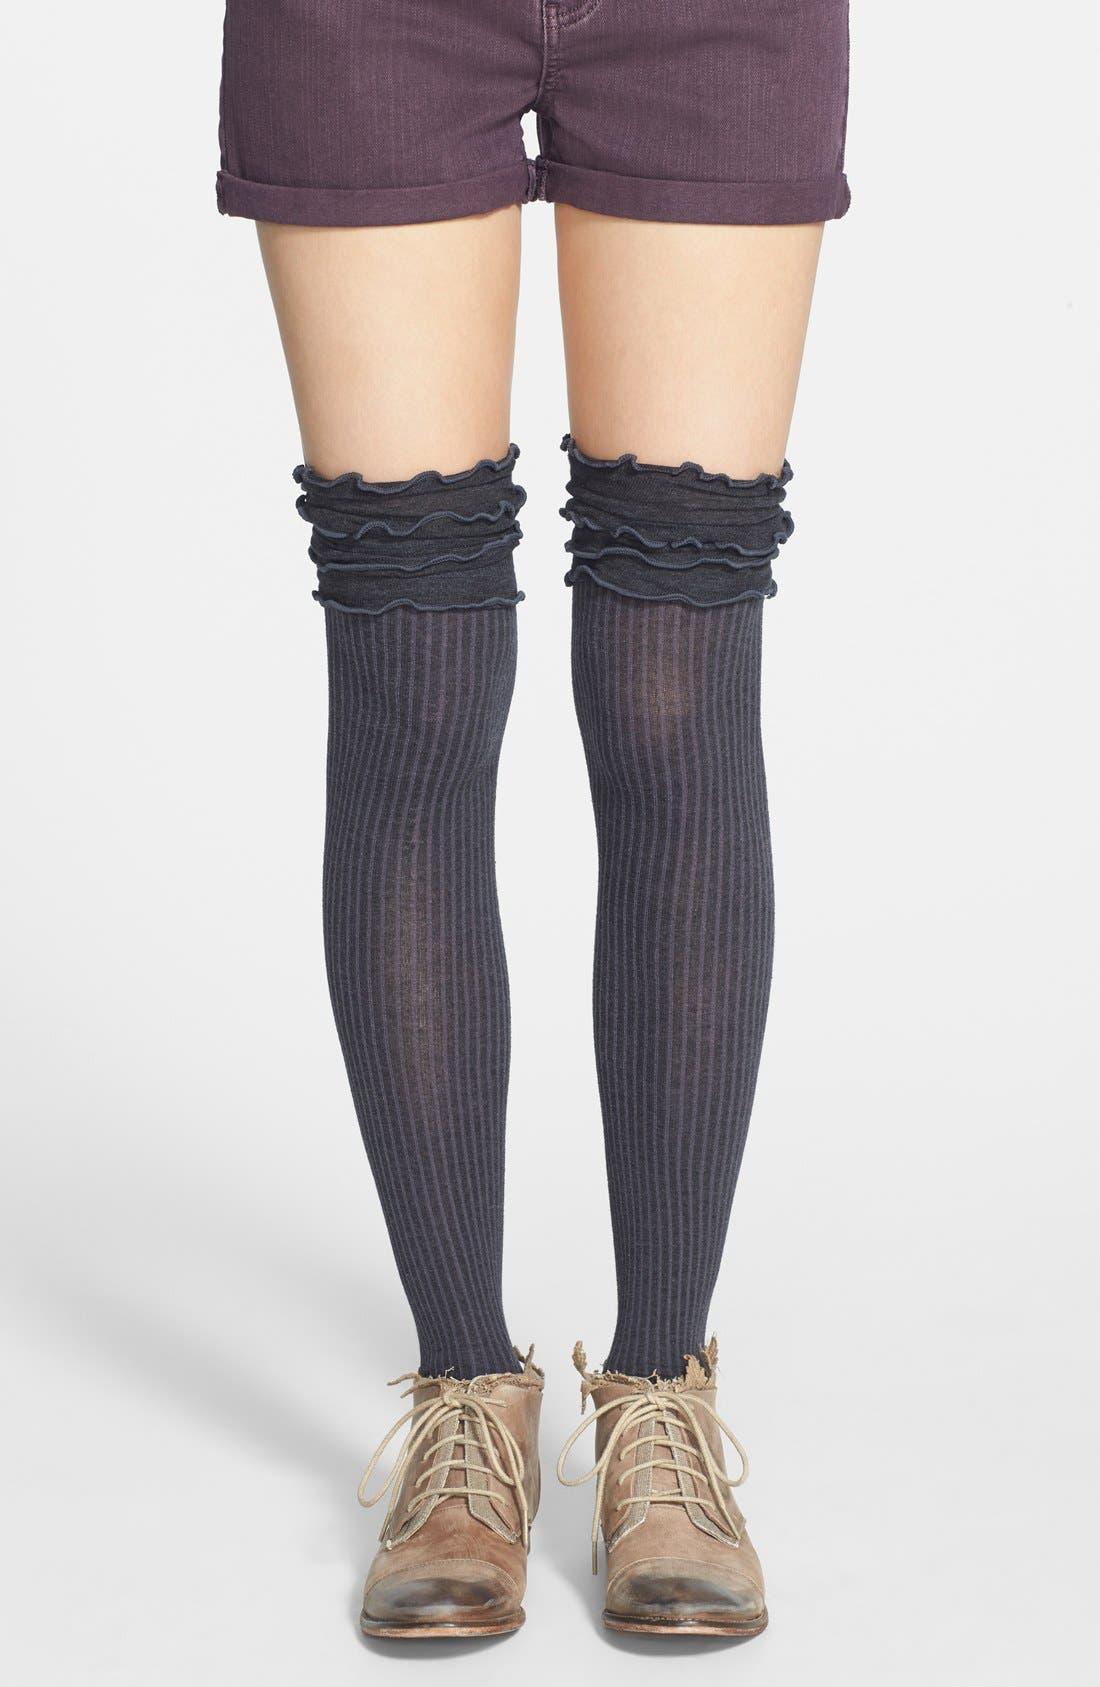 Main Image - Free People 'Fidler' Ruffled Over the Knee Socks